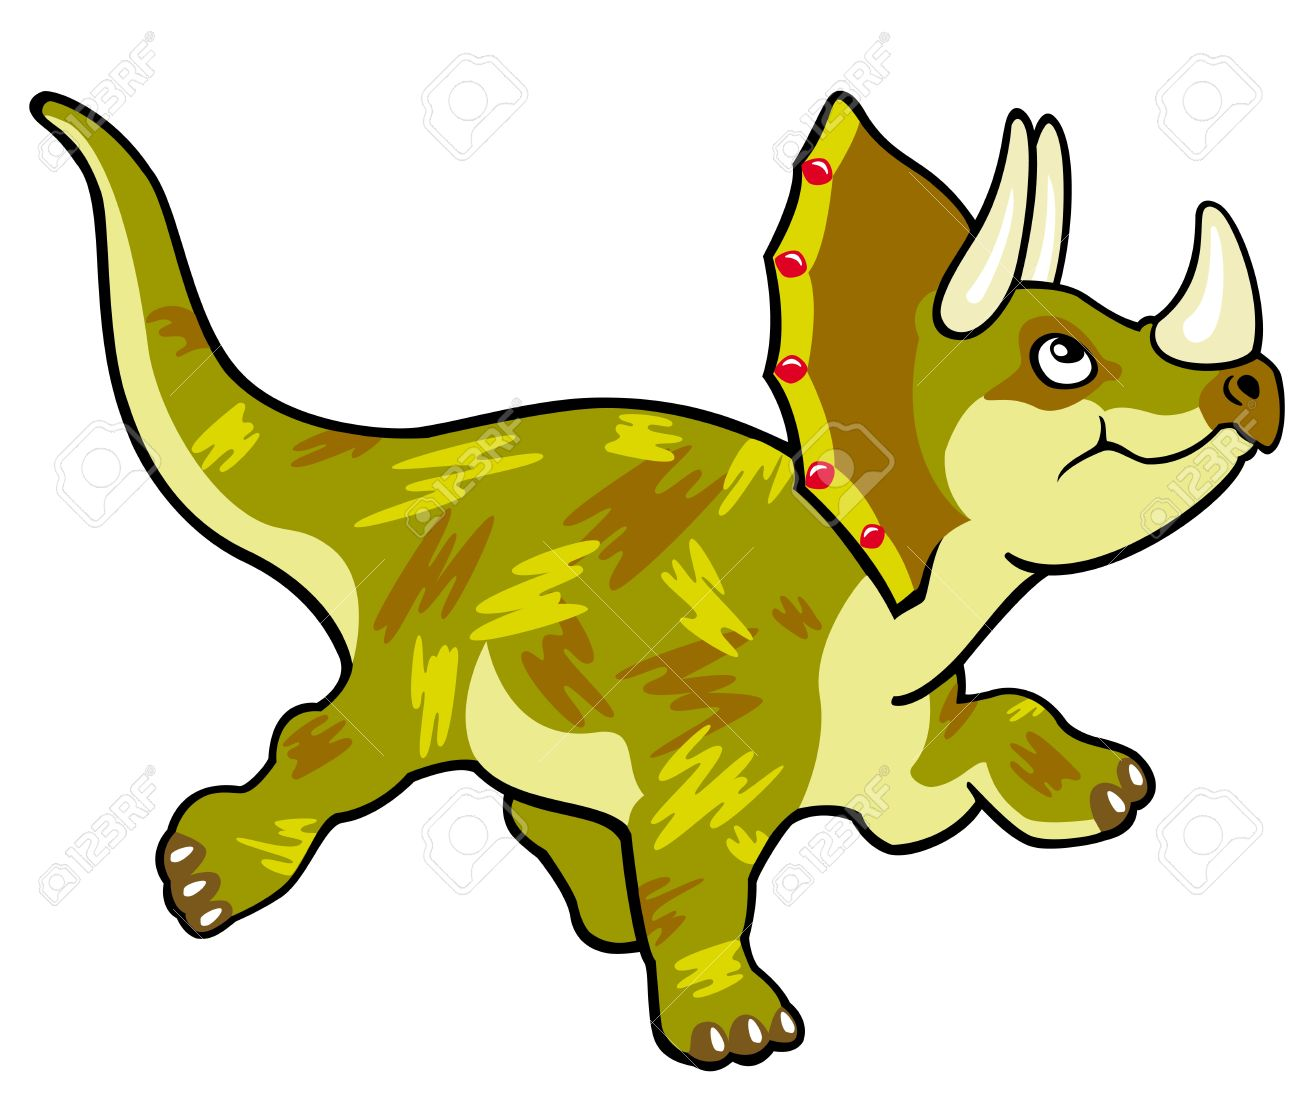 Uncategorized Dinosaur Pictures For Kids cartoon dinosaur triceratopsvector picture isolated on white background children illustrationimage for